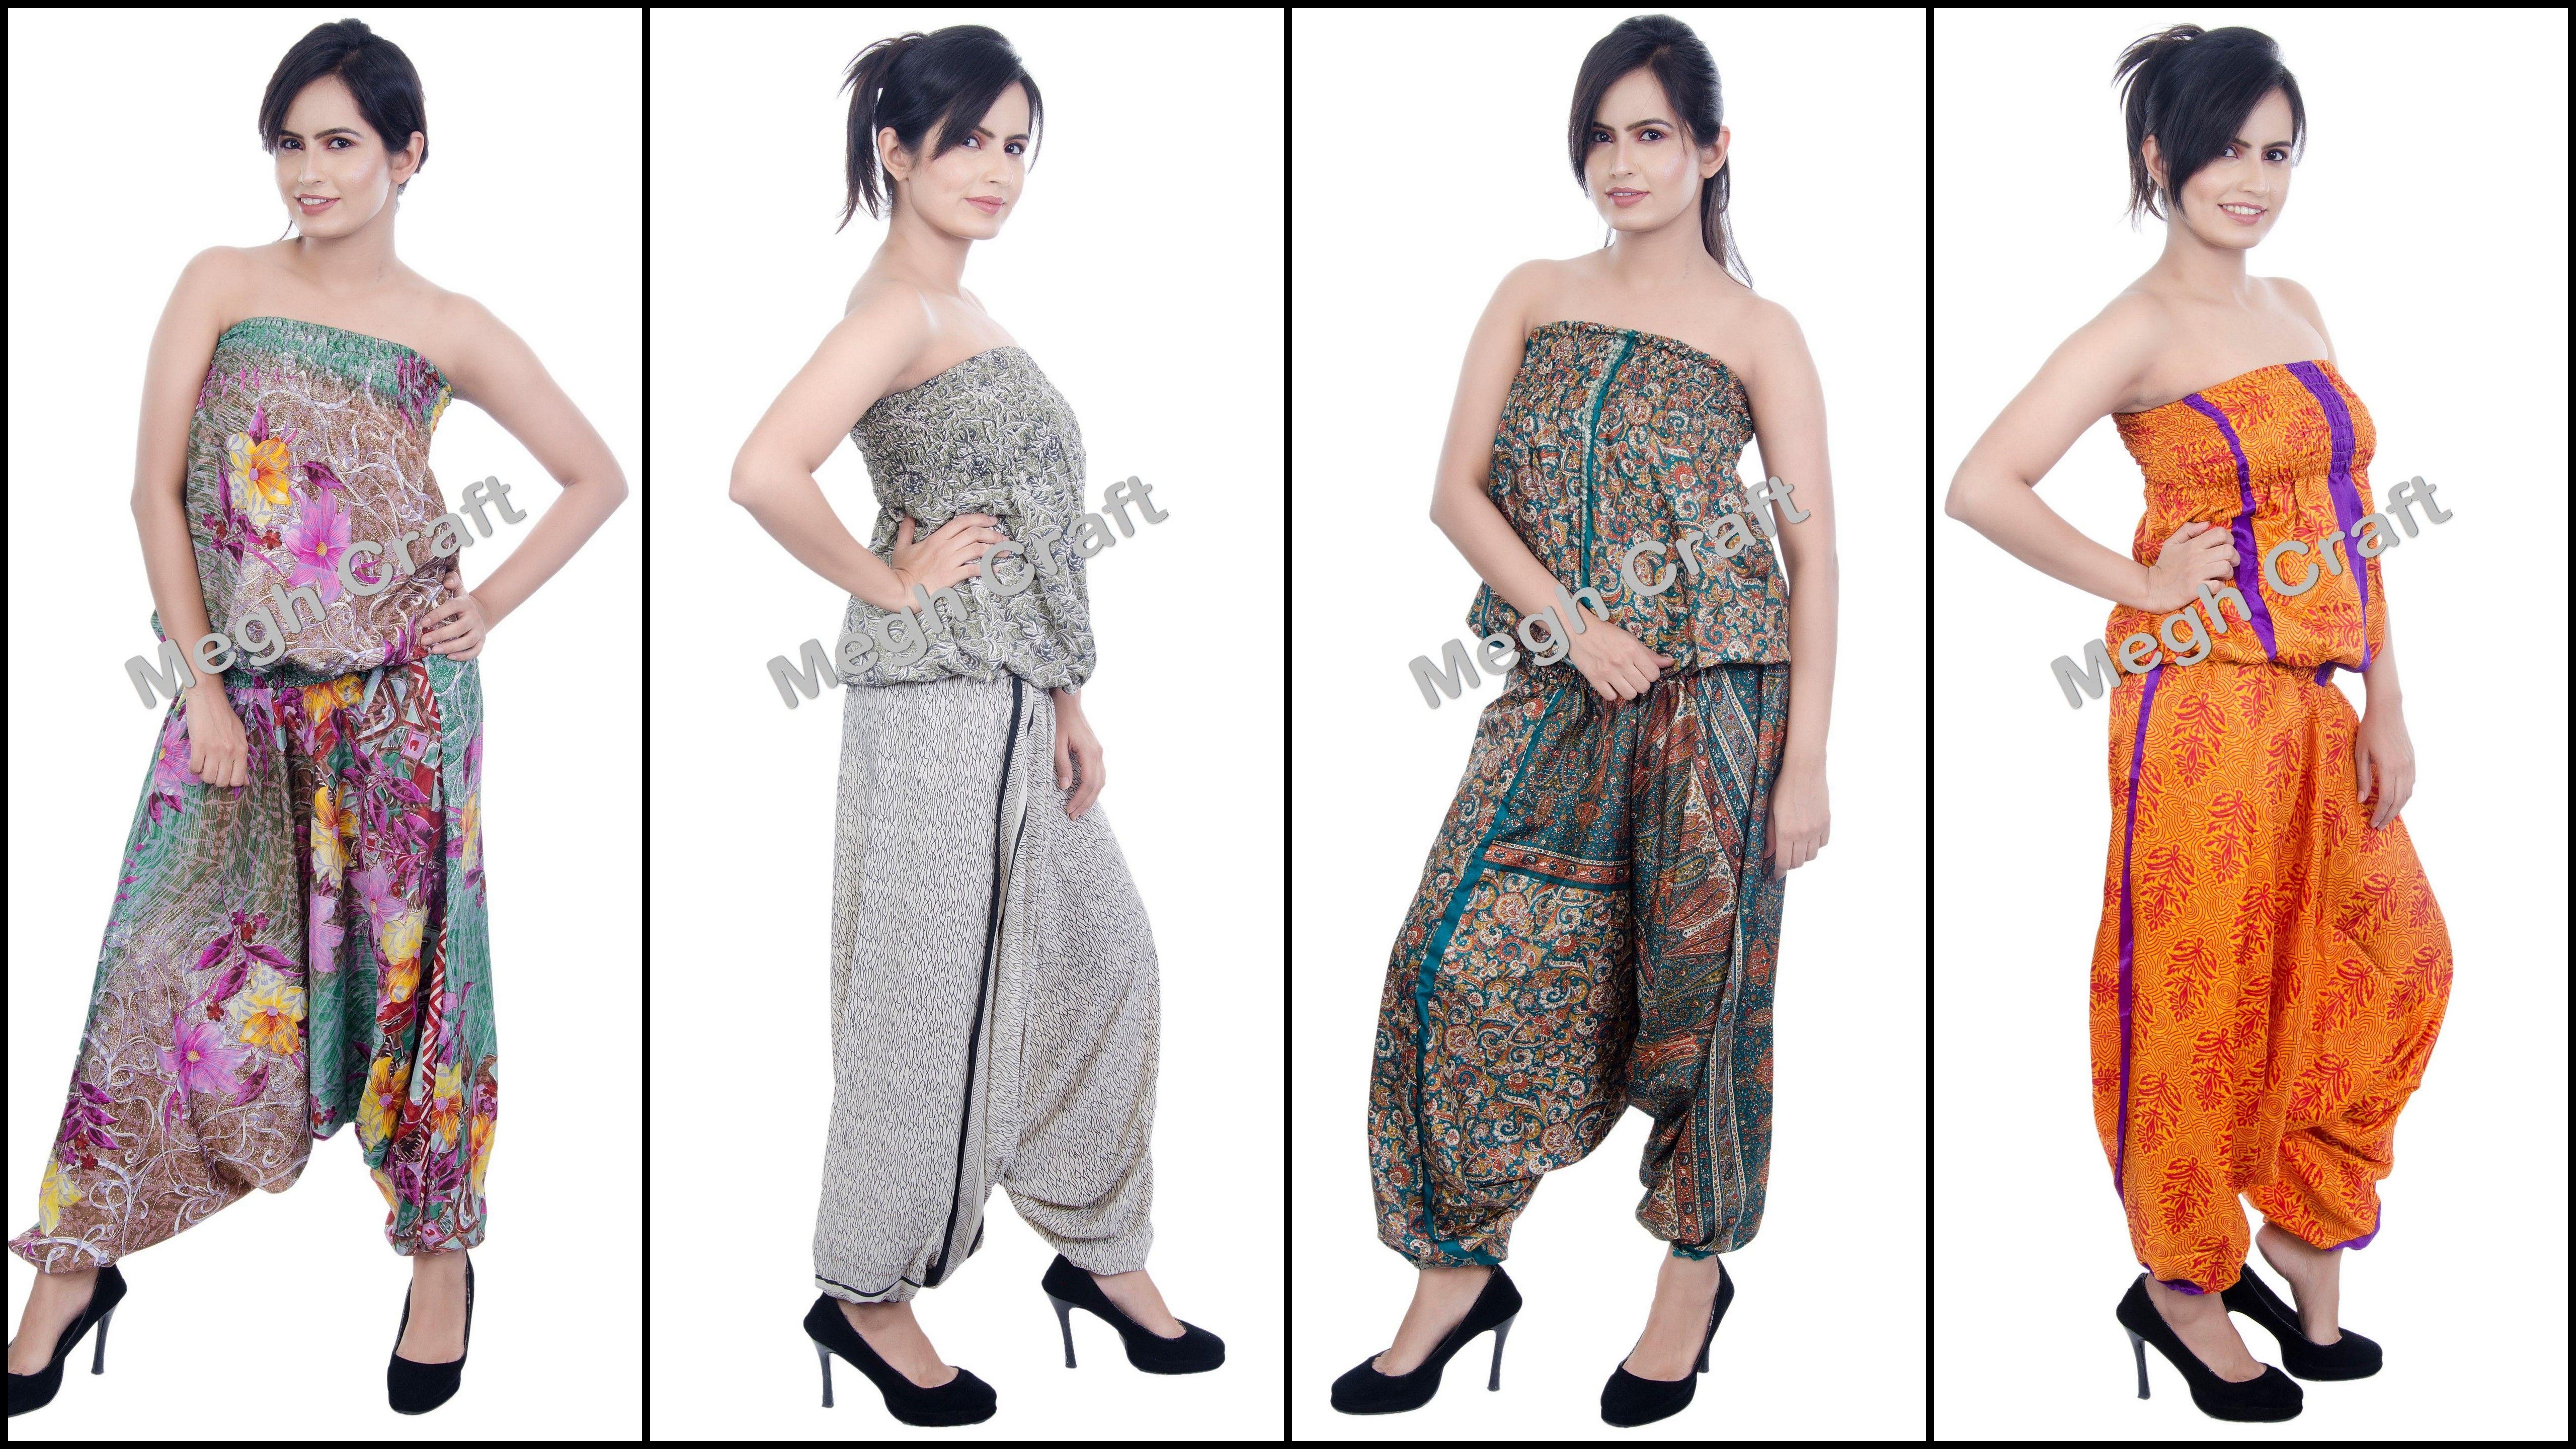 f368694c14a formal Wear jumpsuit   Fushion Wear Jumpsuits Indian Summer Silk jumpsuits  BY  CraftsOfGujarat  craftnfashion  meghcraft  indianethnicjewelry